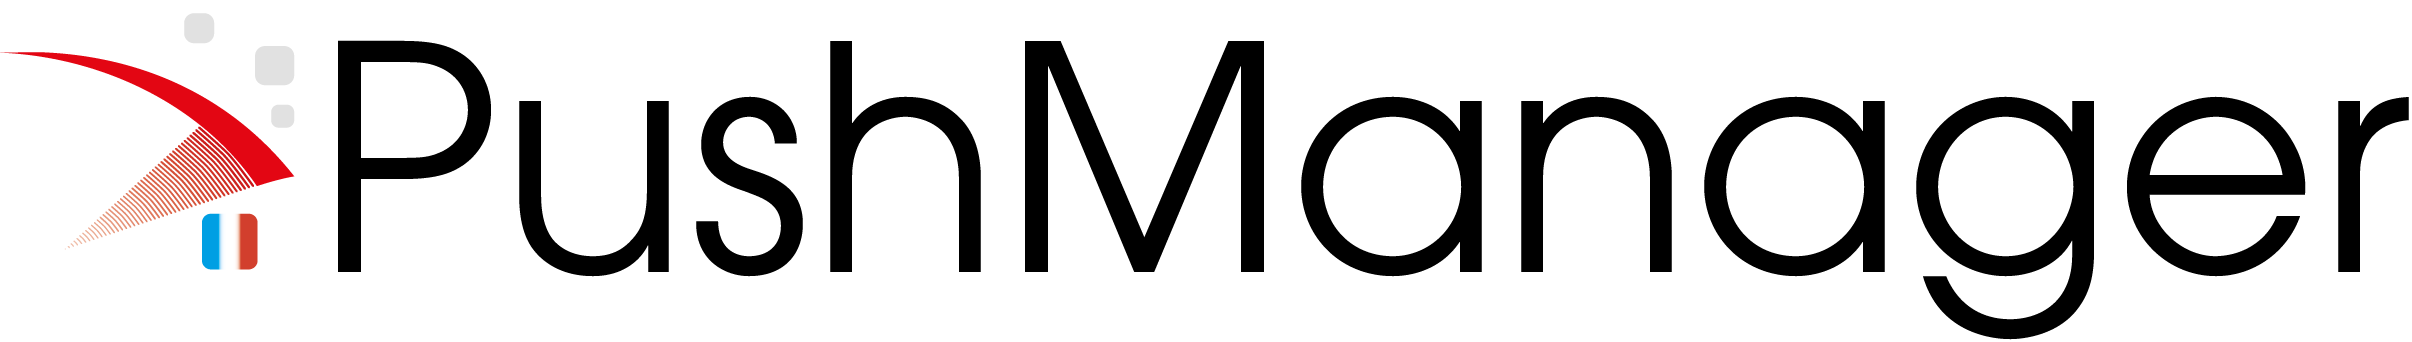 Logo PushManager